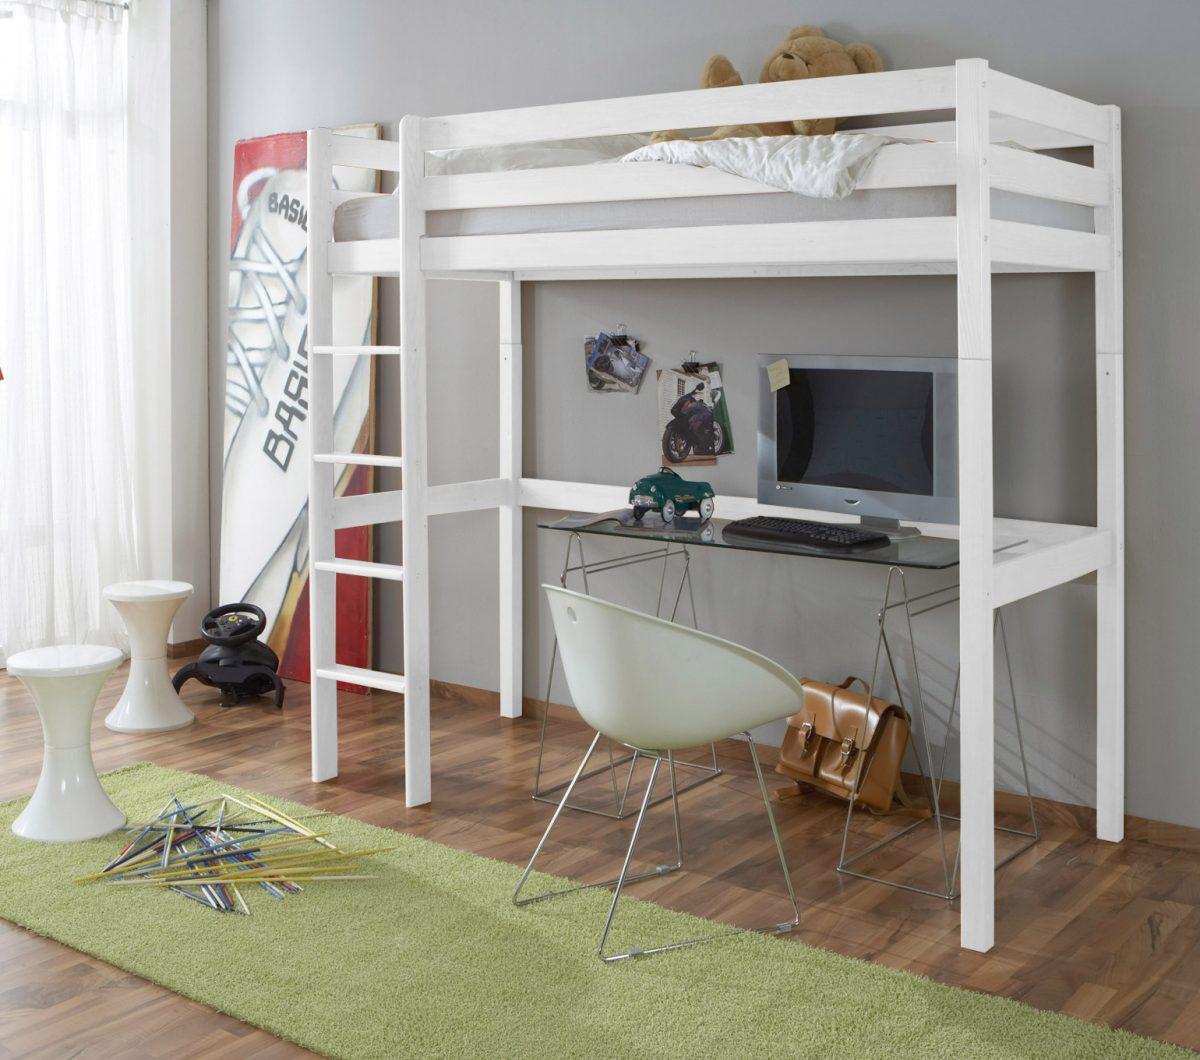 kinderhochbett tolly gl buche wei lackiert modernes. Black Bedroom Furniture Sets. Home Design Ideas